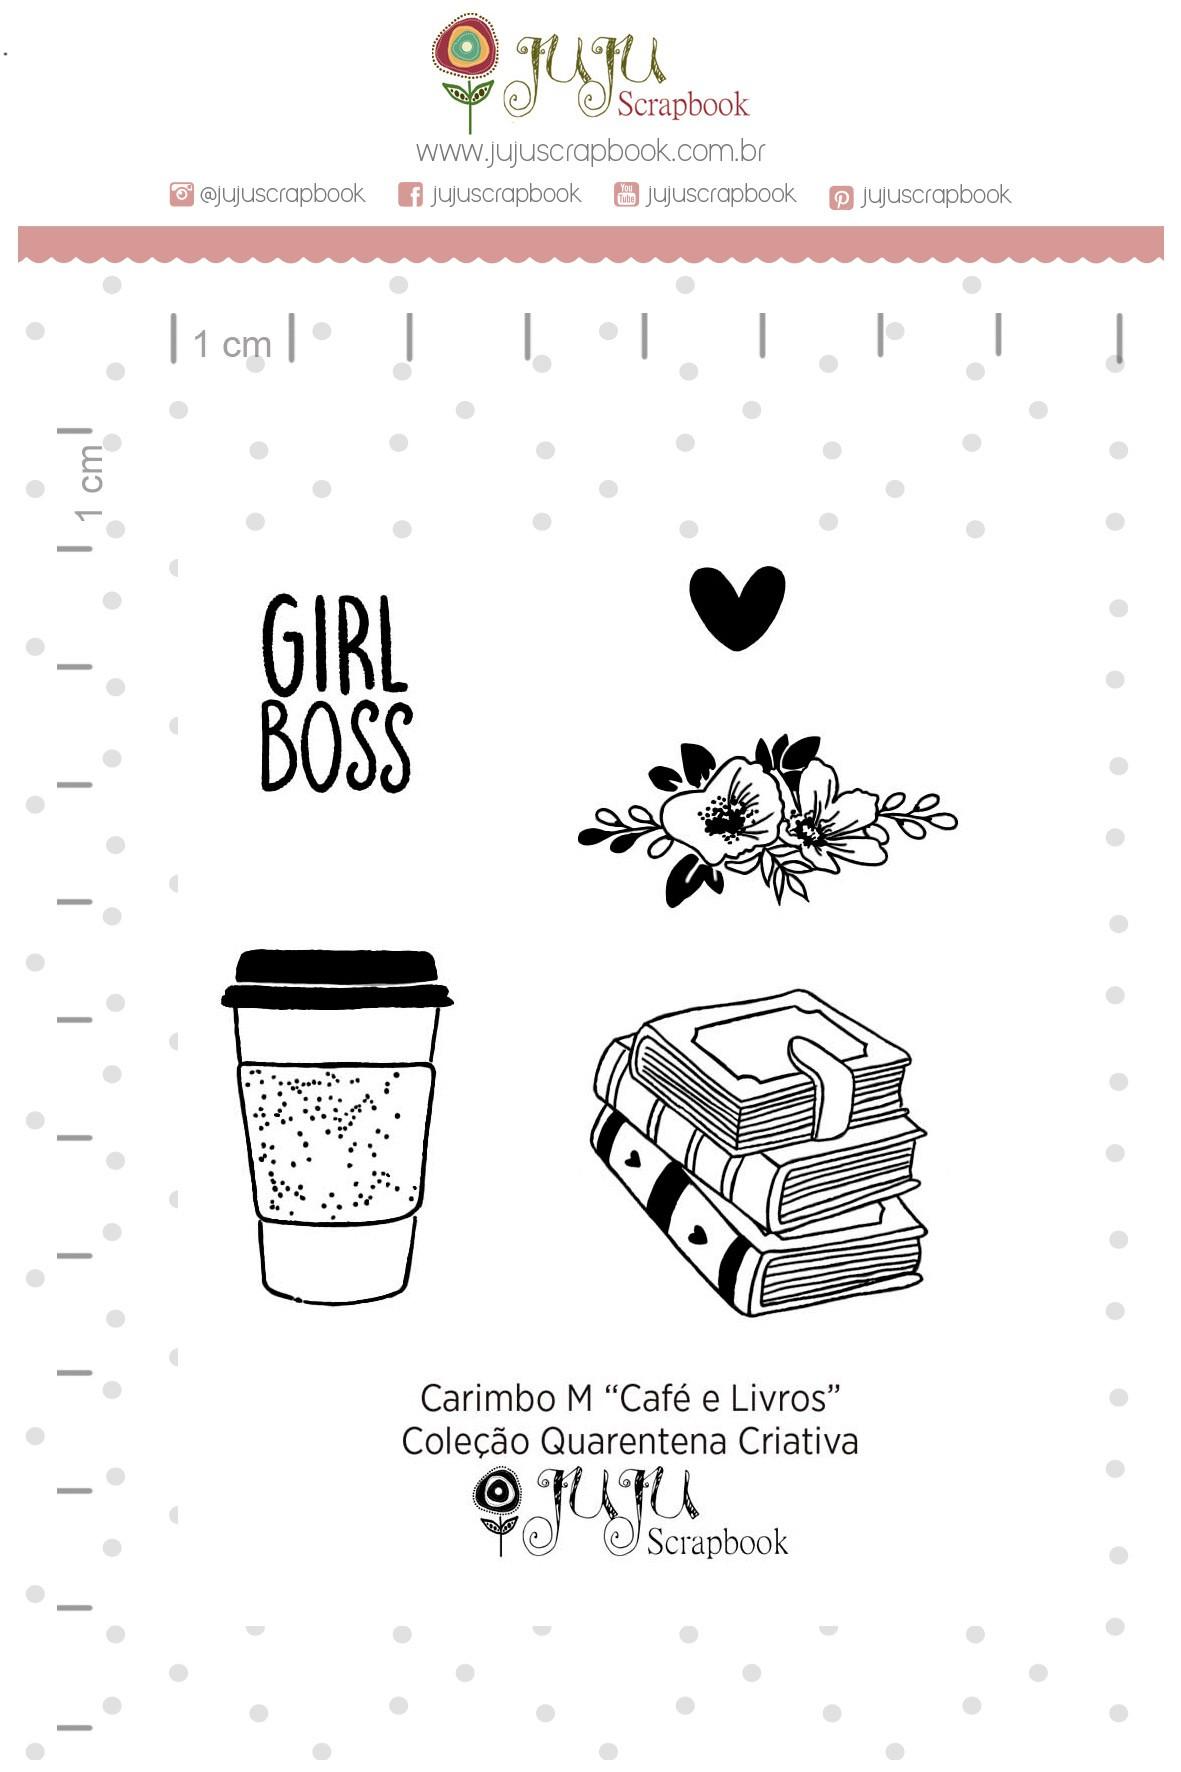 Kit de Carimbos  M - Café e Livros - Juju Scrapbook